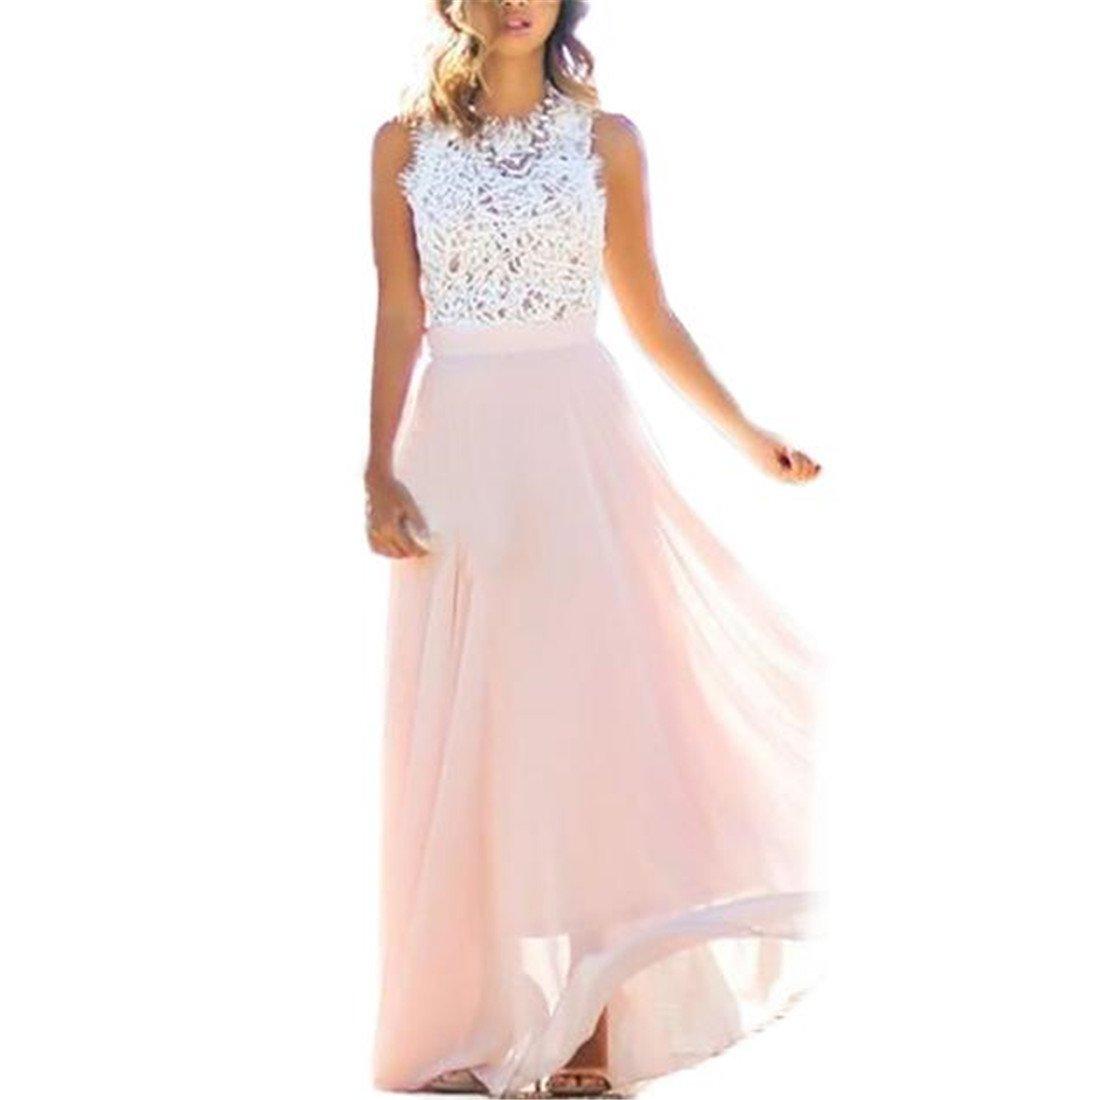 Btruely Damen Sommer Mode Spitze Strandkleid (Asien Größe:XL, Pink) rfeofjs_2586